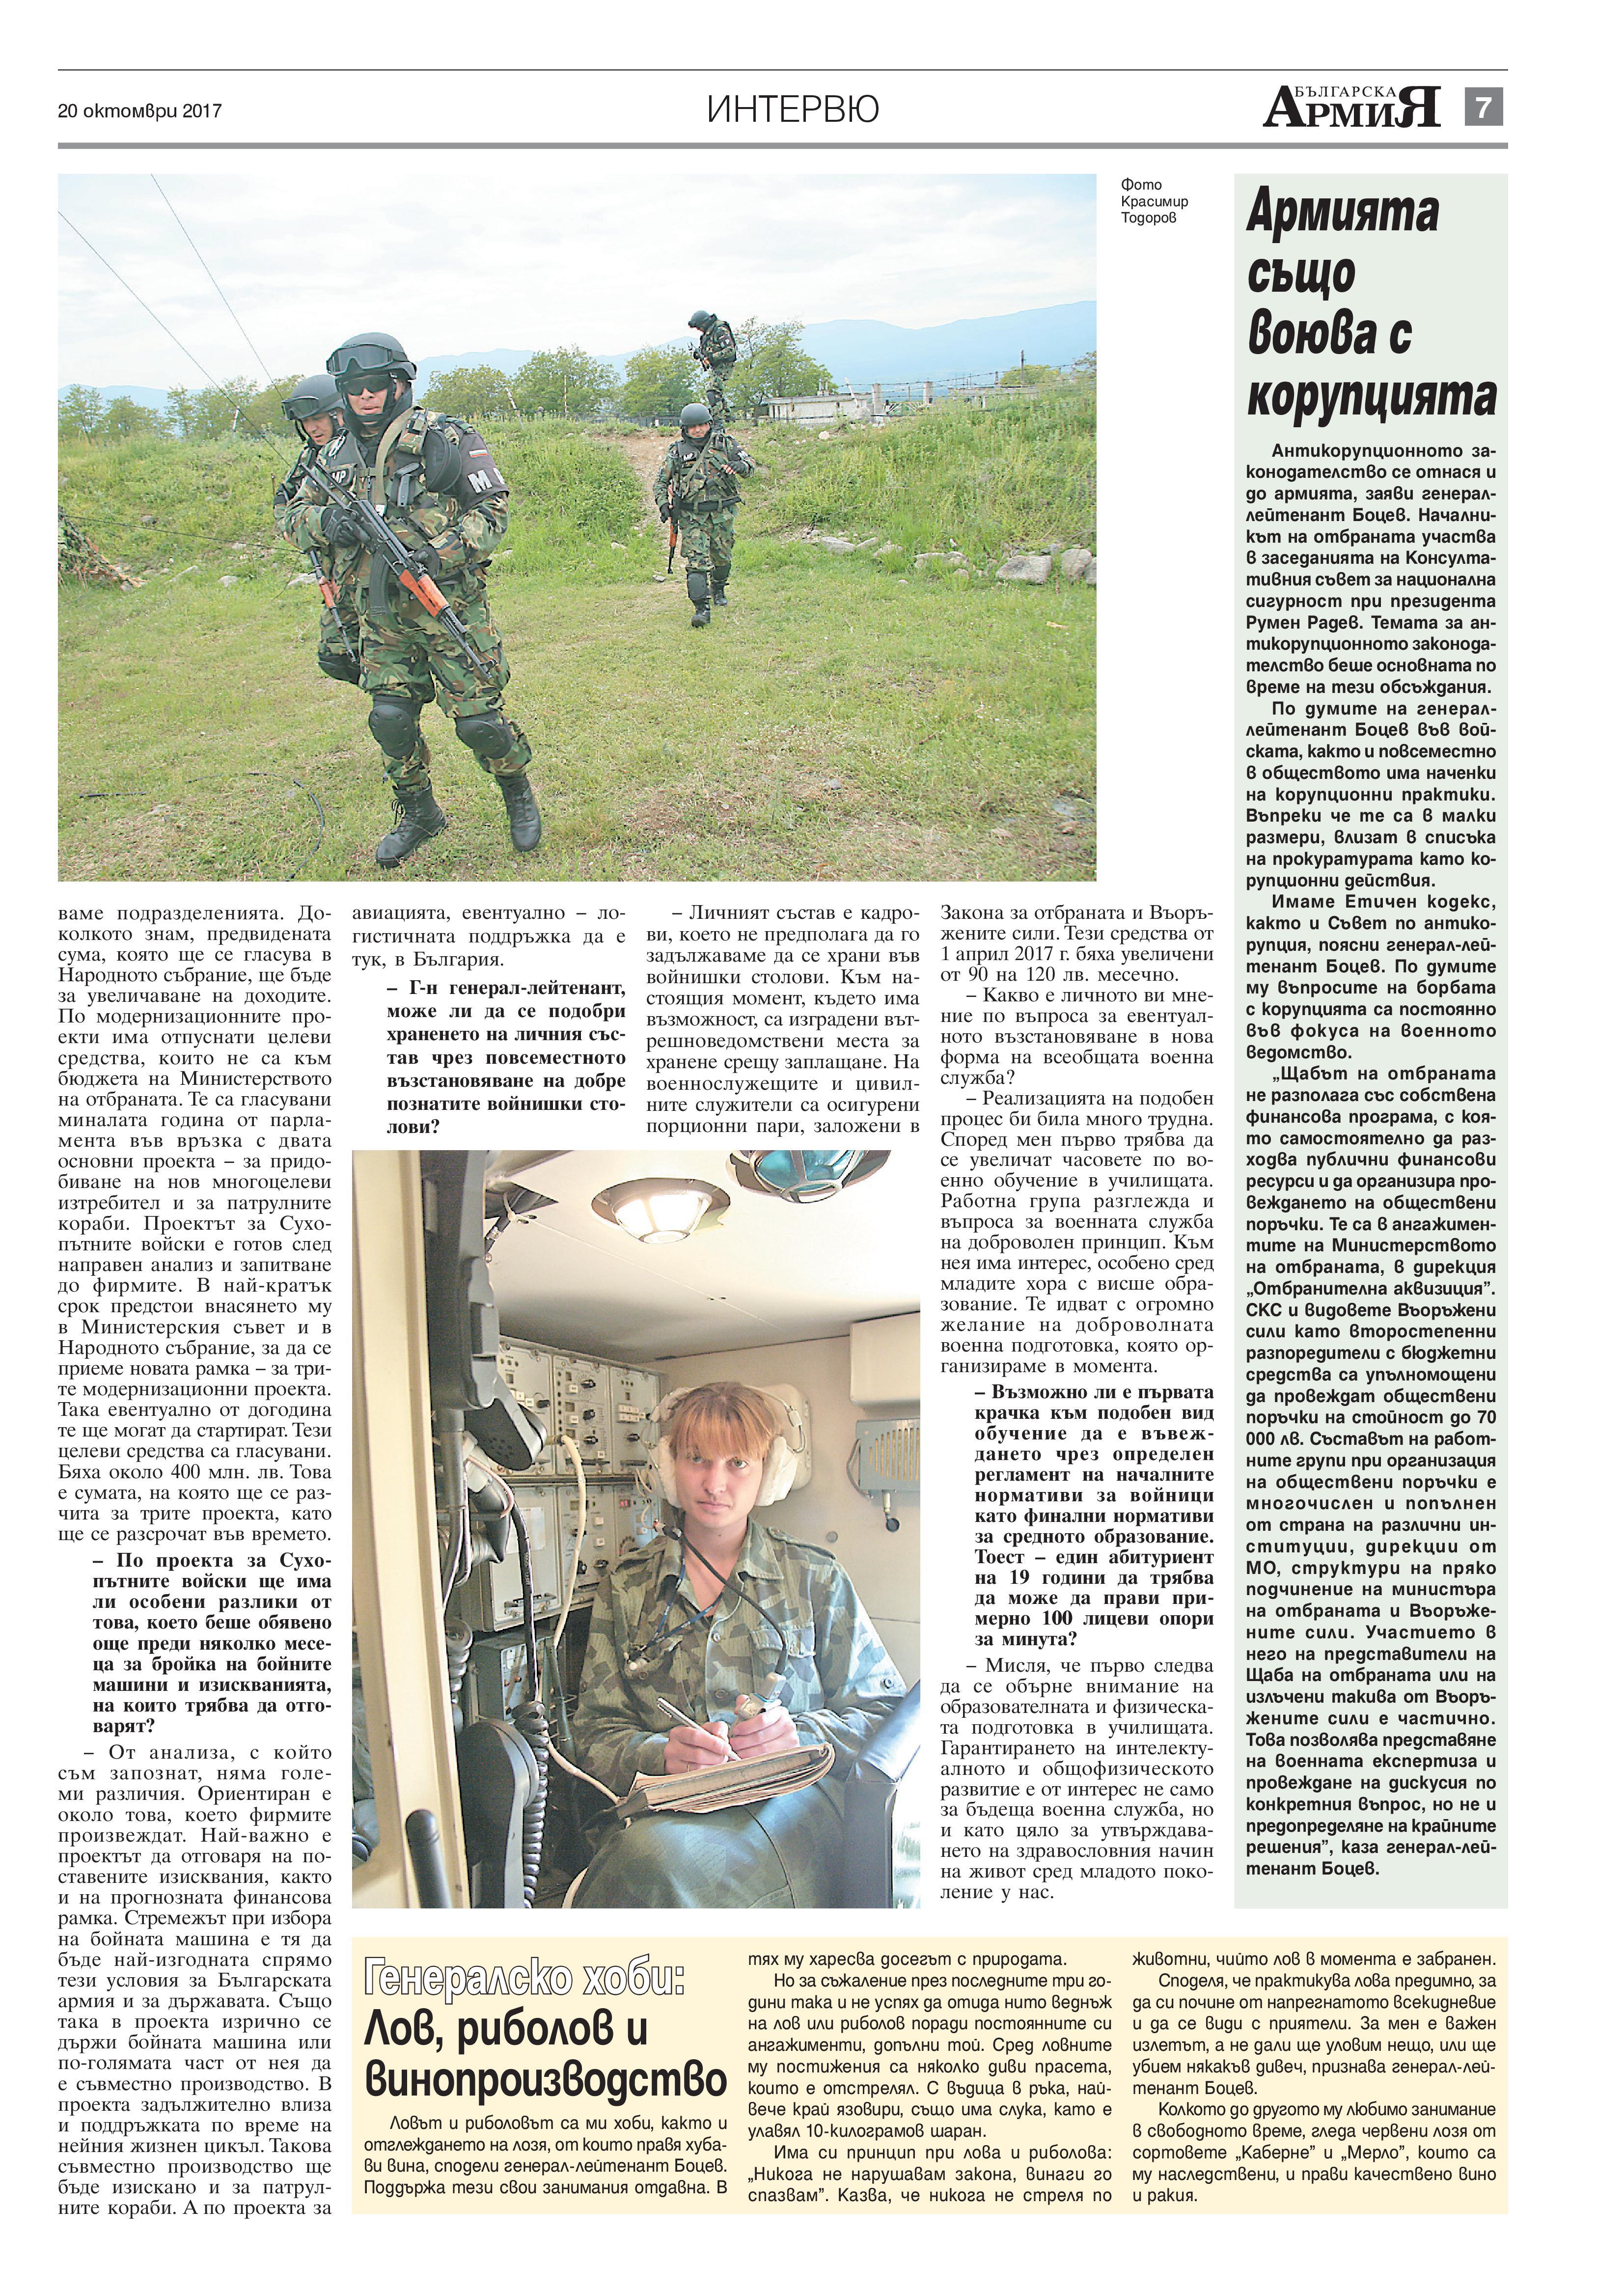 http://armymedia.bg/wp-content/uploads/2015/06/07-7.jpg